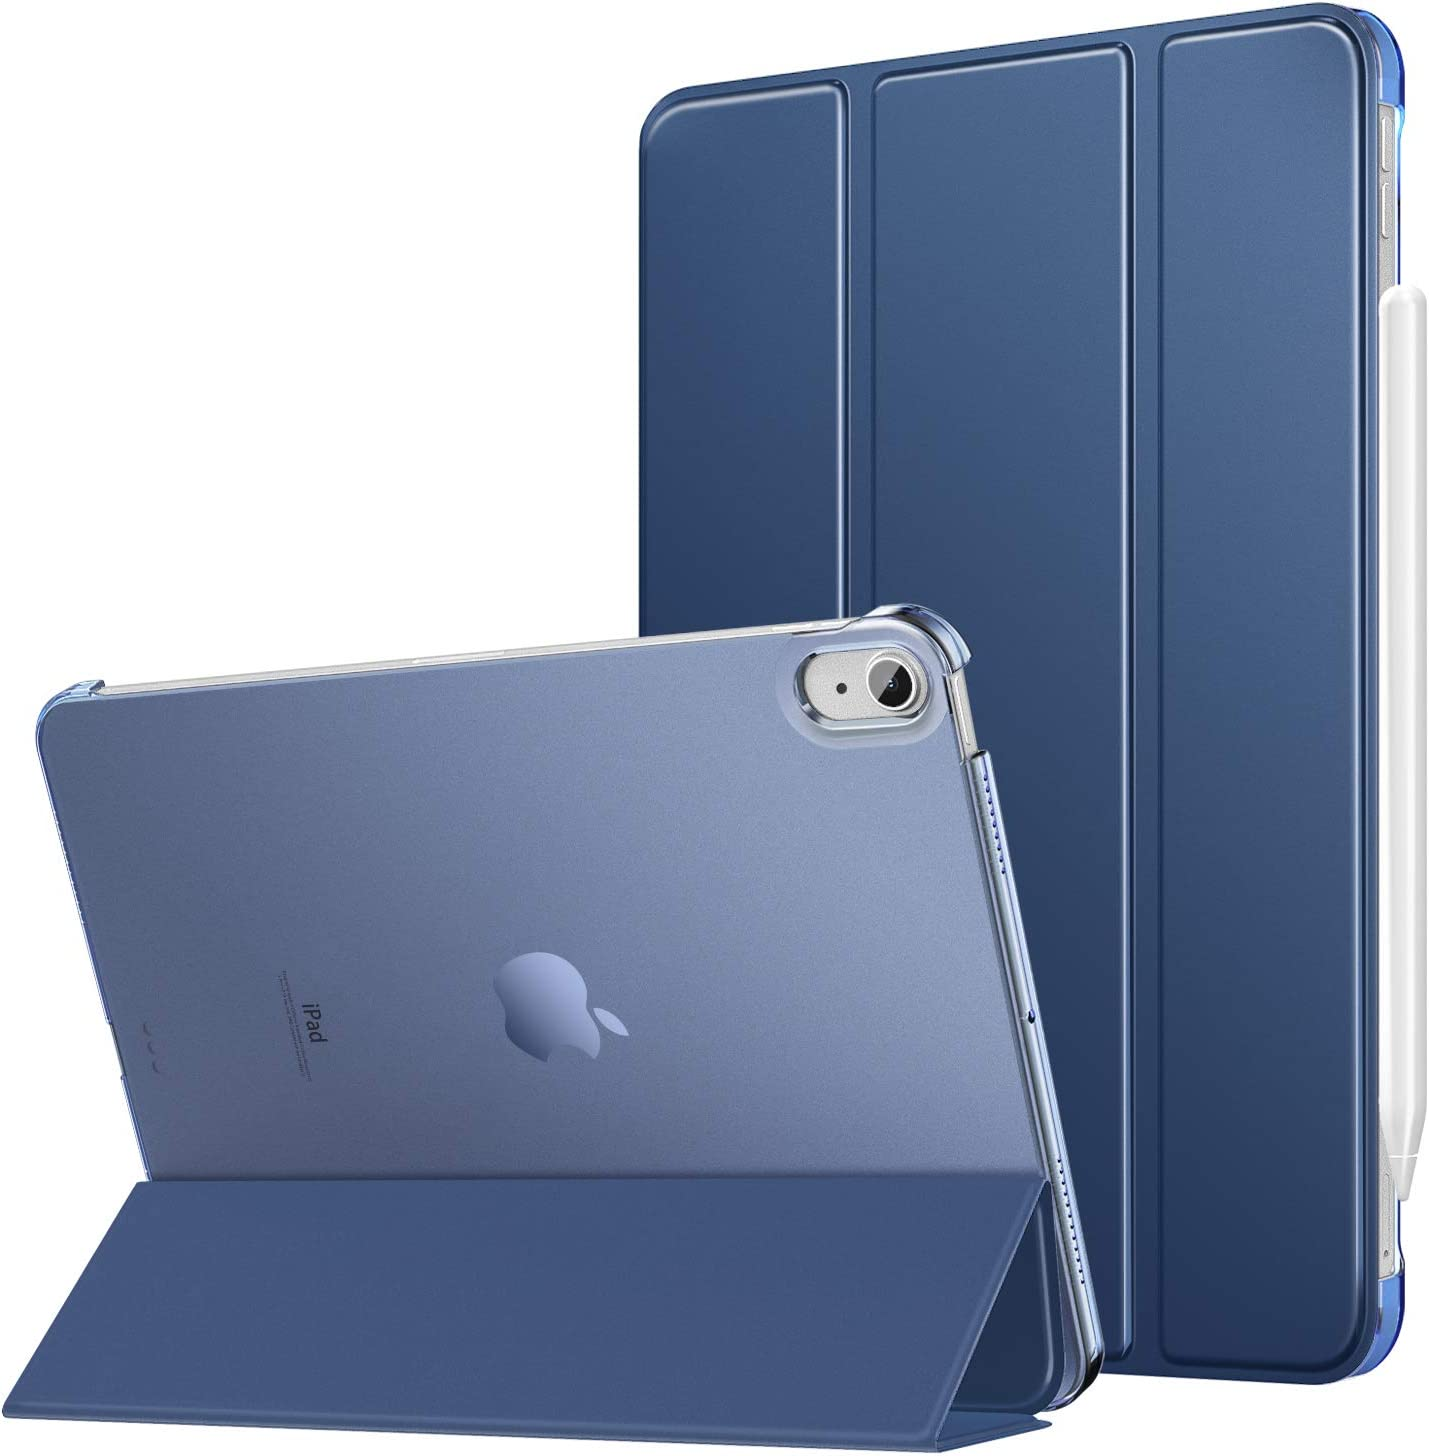 MoKo Funda para iPad Air 4ta Generación 2020 iPad 10.9 2020 Tableta, [Admite Carga Inalámbrica Apple Pencil] Trasera Transparente Ultra Delgado Soporte Protectora Plegable Cubierta, Azul Marino